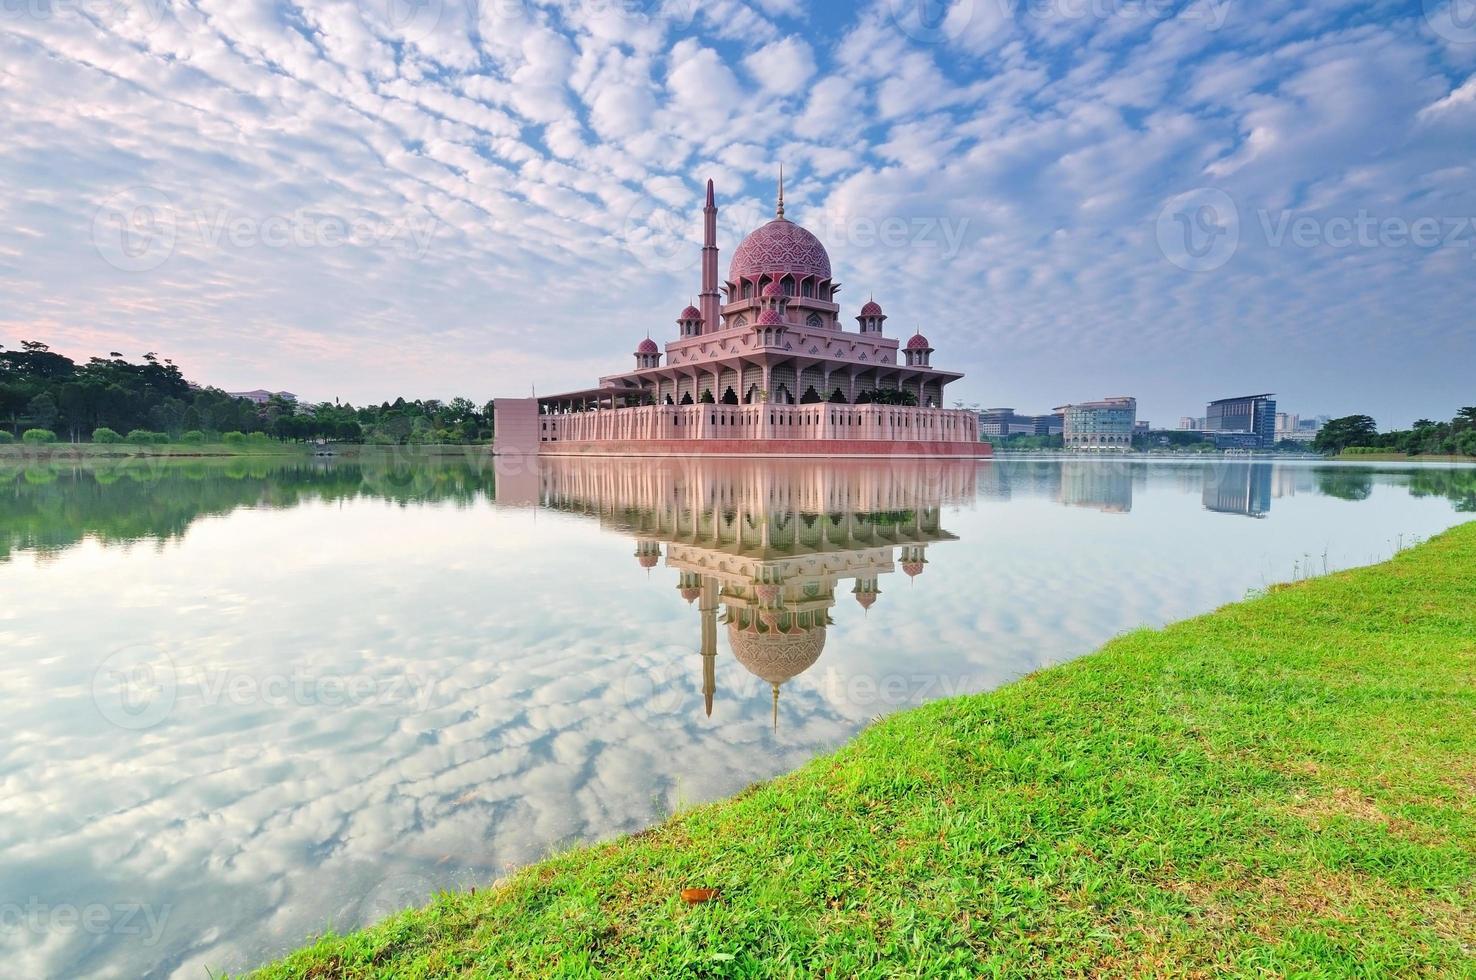 Moschea Putra di riflessione, Putrajaya, Kuala Lumpur foto